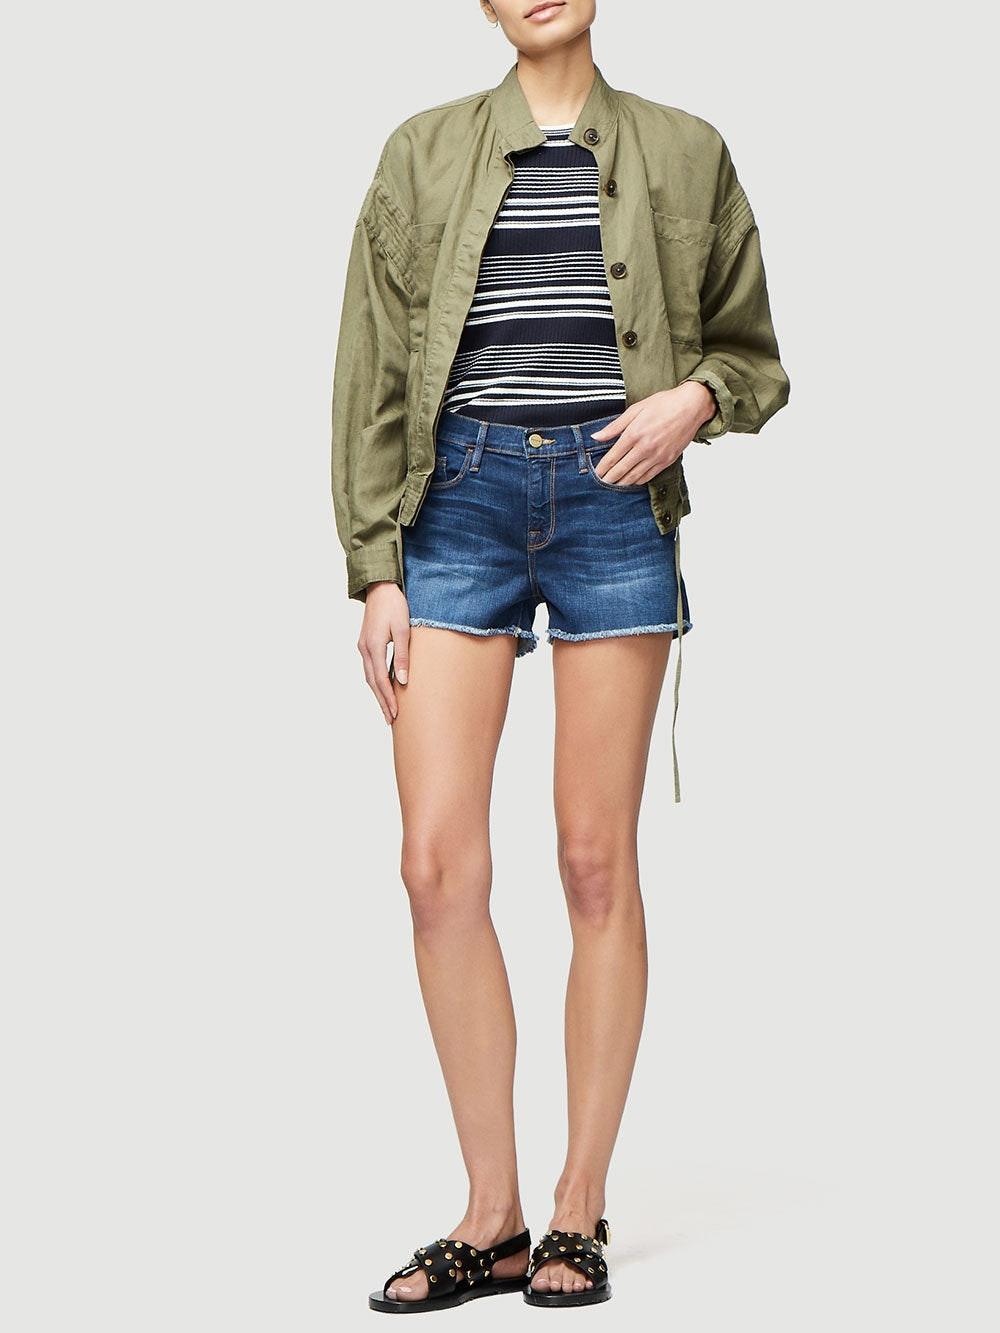 shorts full body view alt:hover